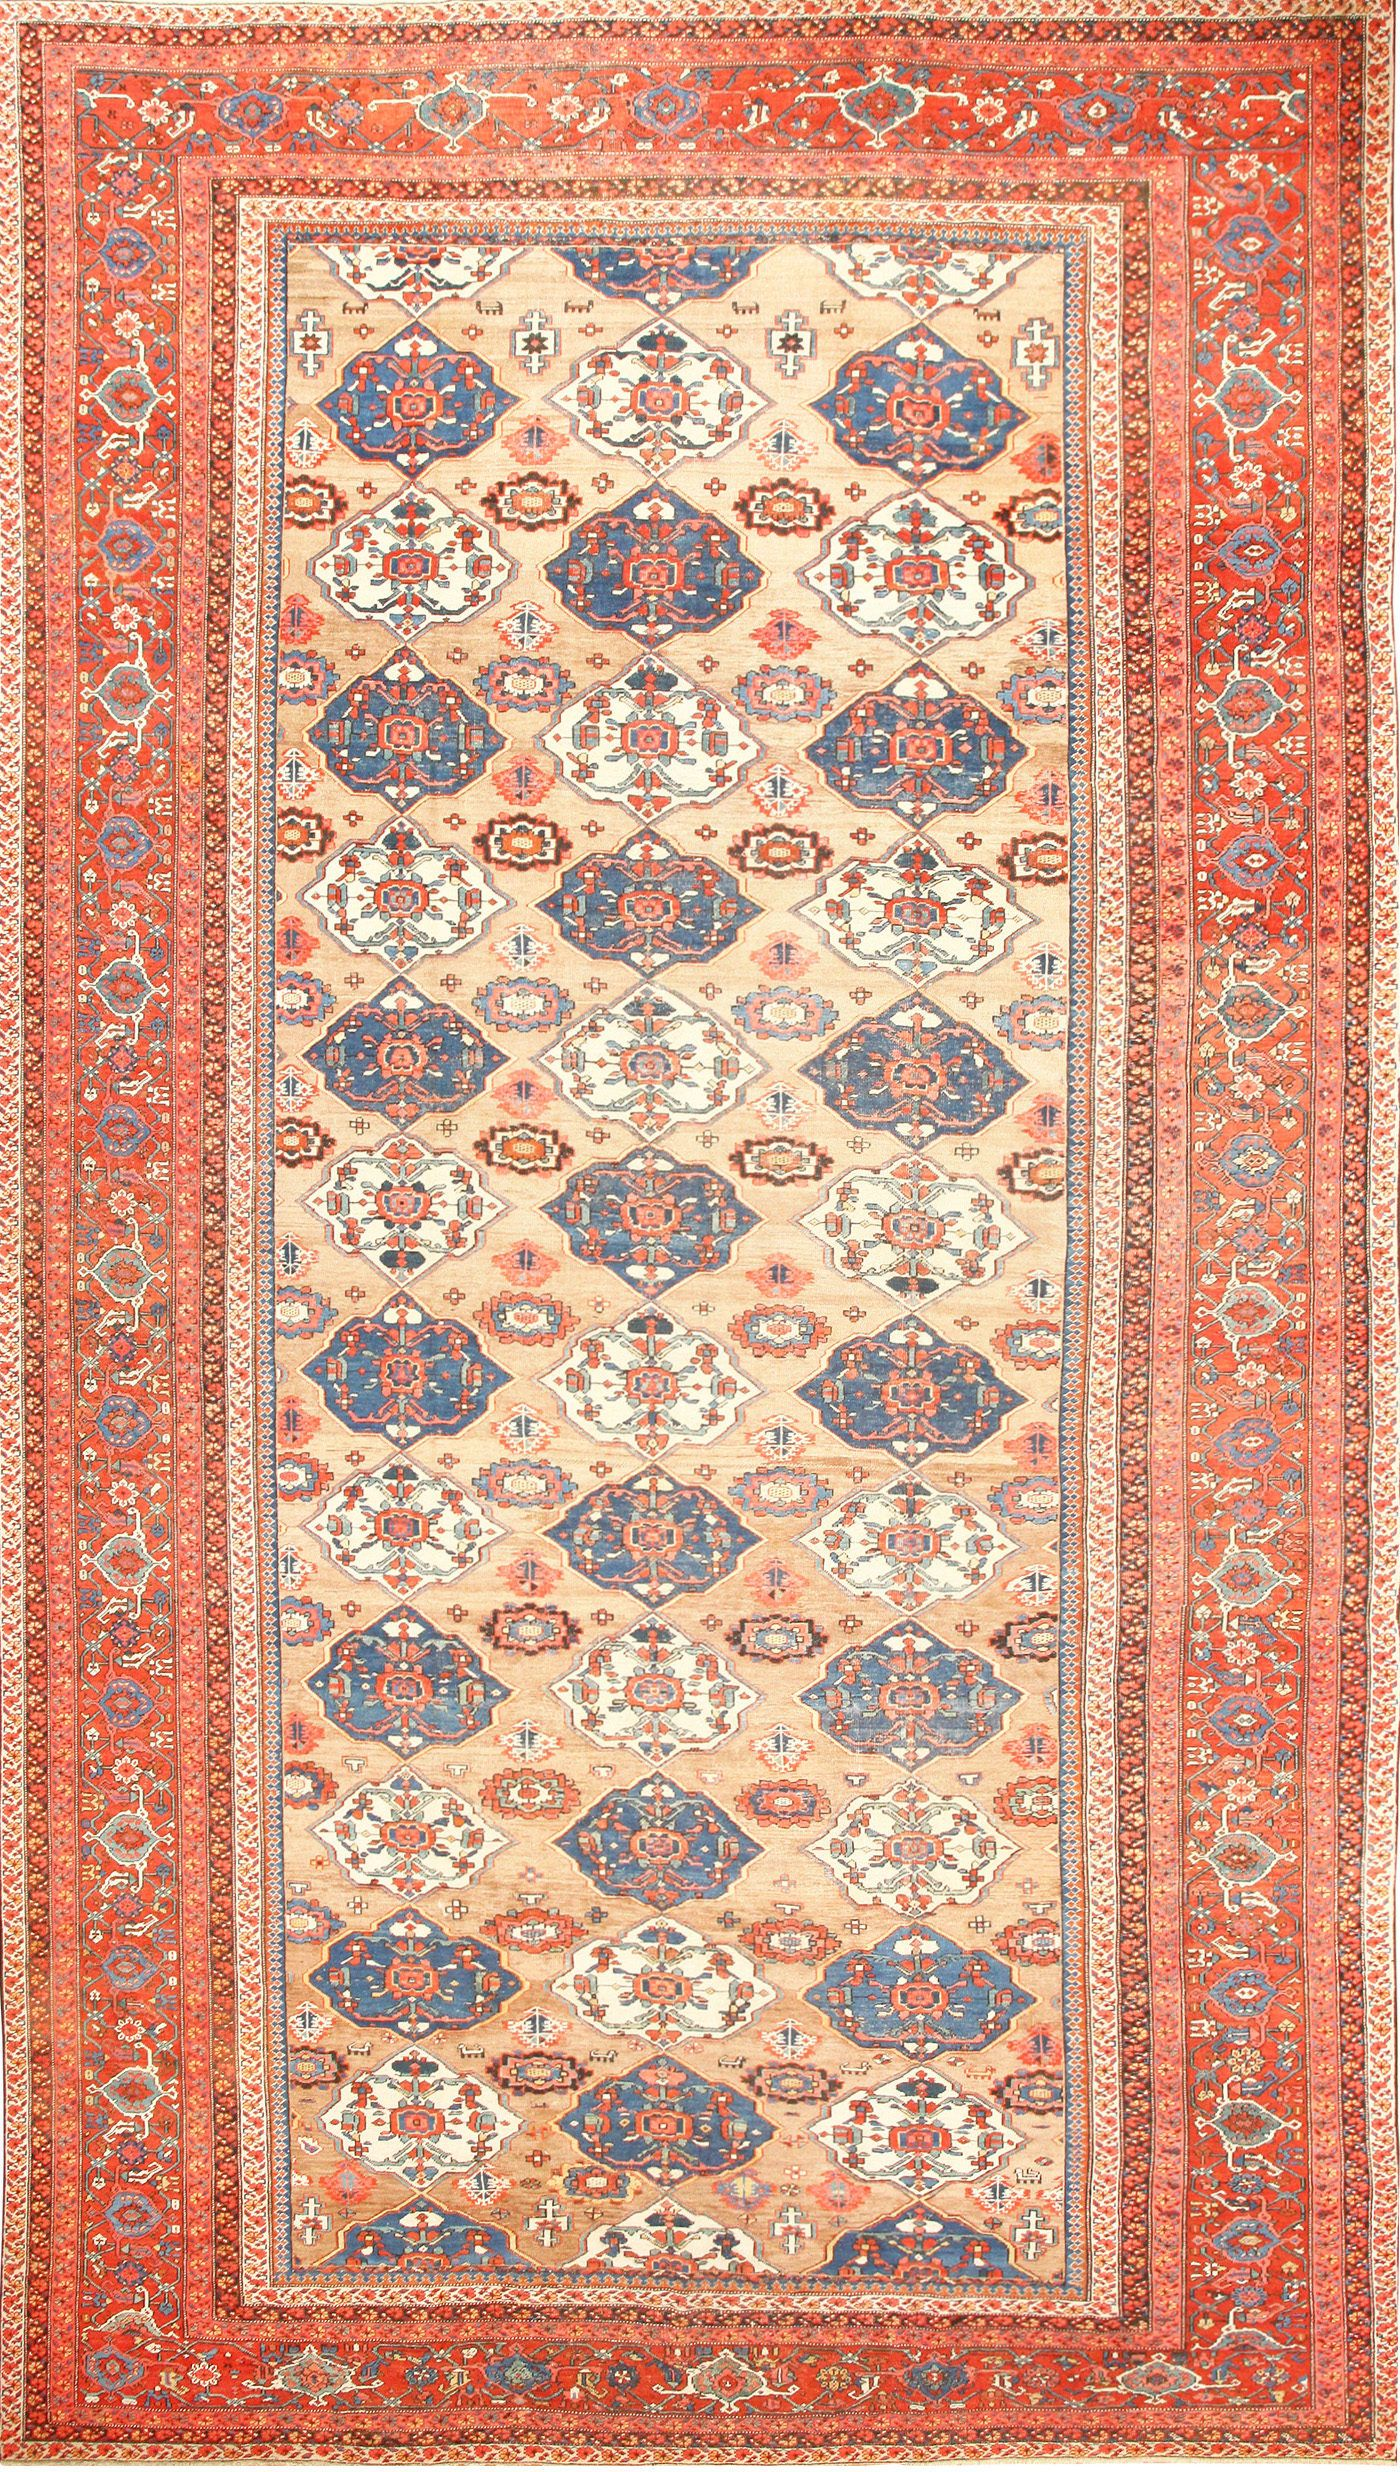 Large Antique Persian Bakshaish Rug 50713 By Nazmiyal Rugs Simple Carpets Rugs On Carpet